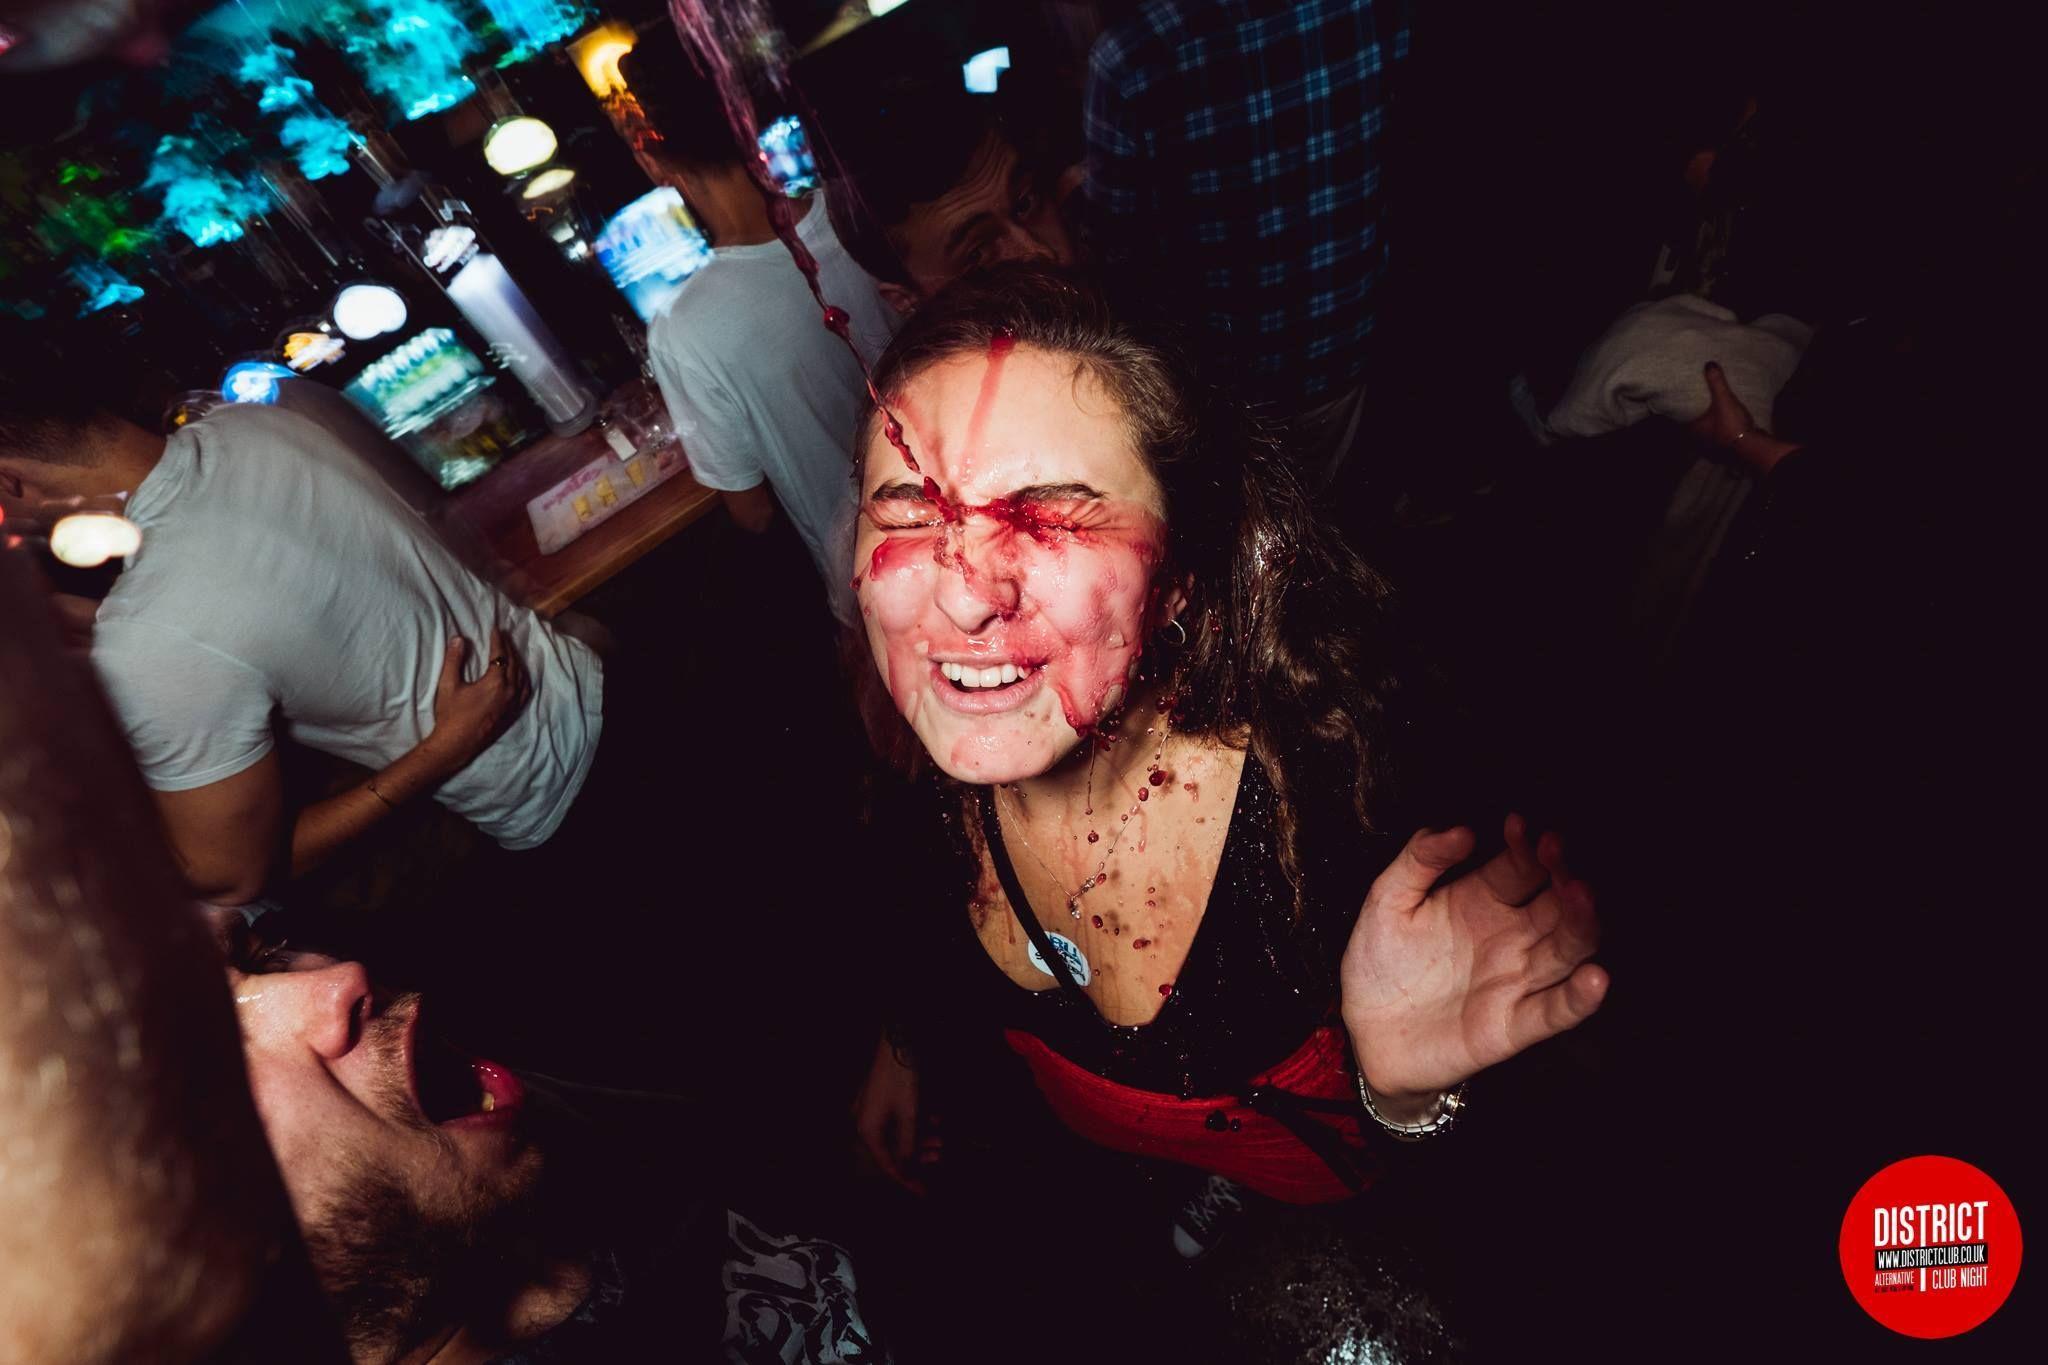 Image may contain: Night Club, Club, Night Life, Bar Counter, Person, Human, Pub